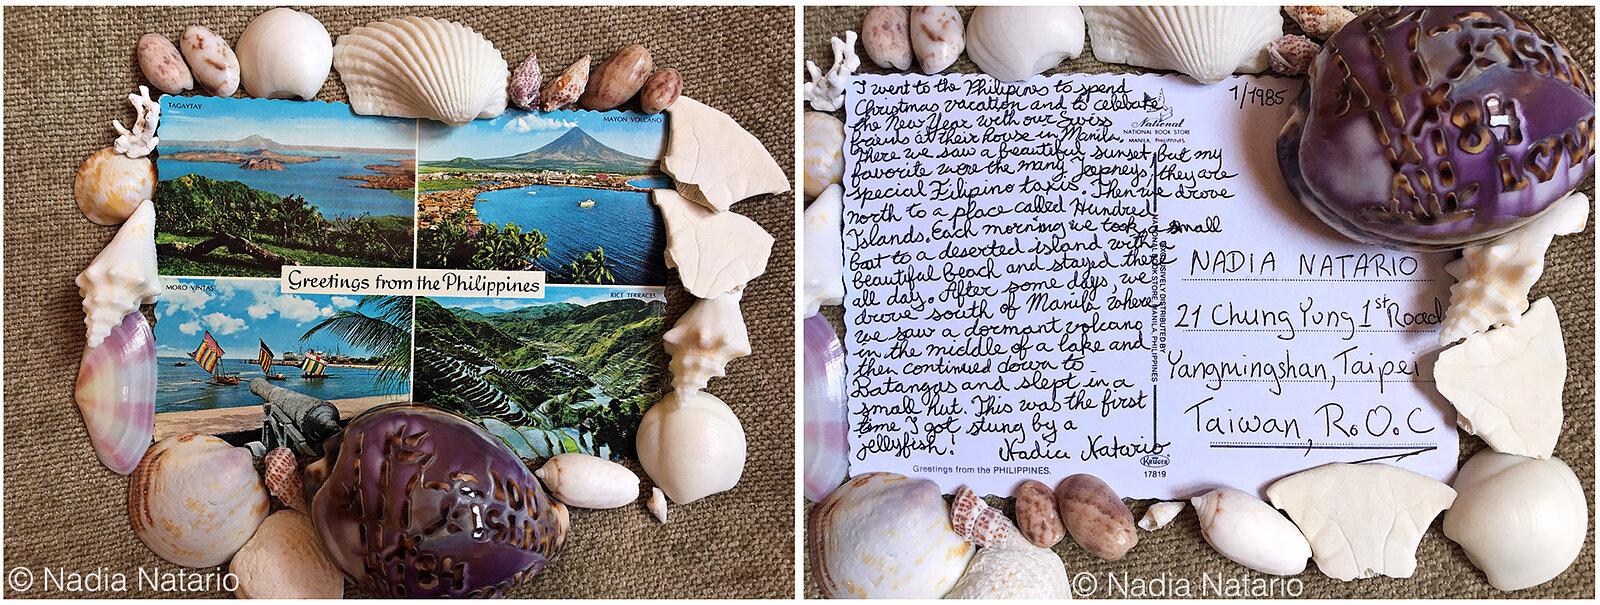 Postcards to Myself - Philippines, 1985